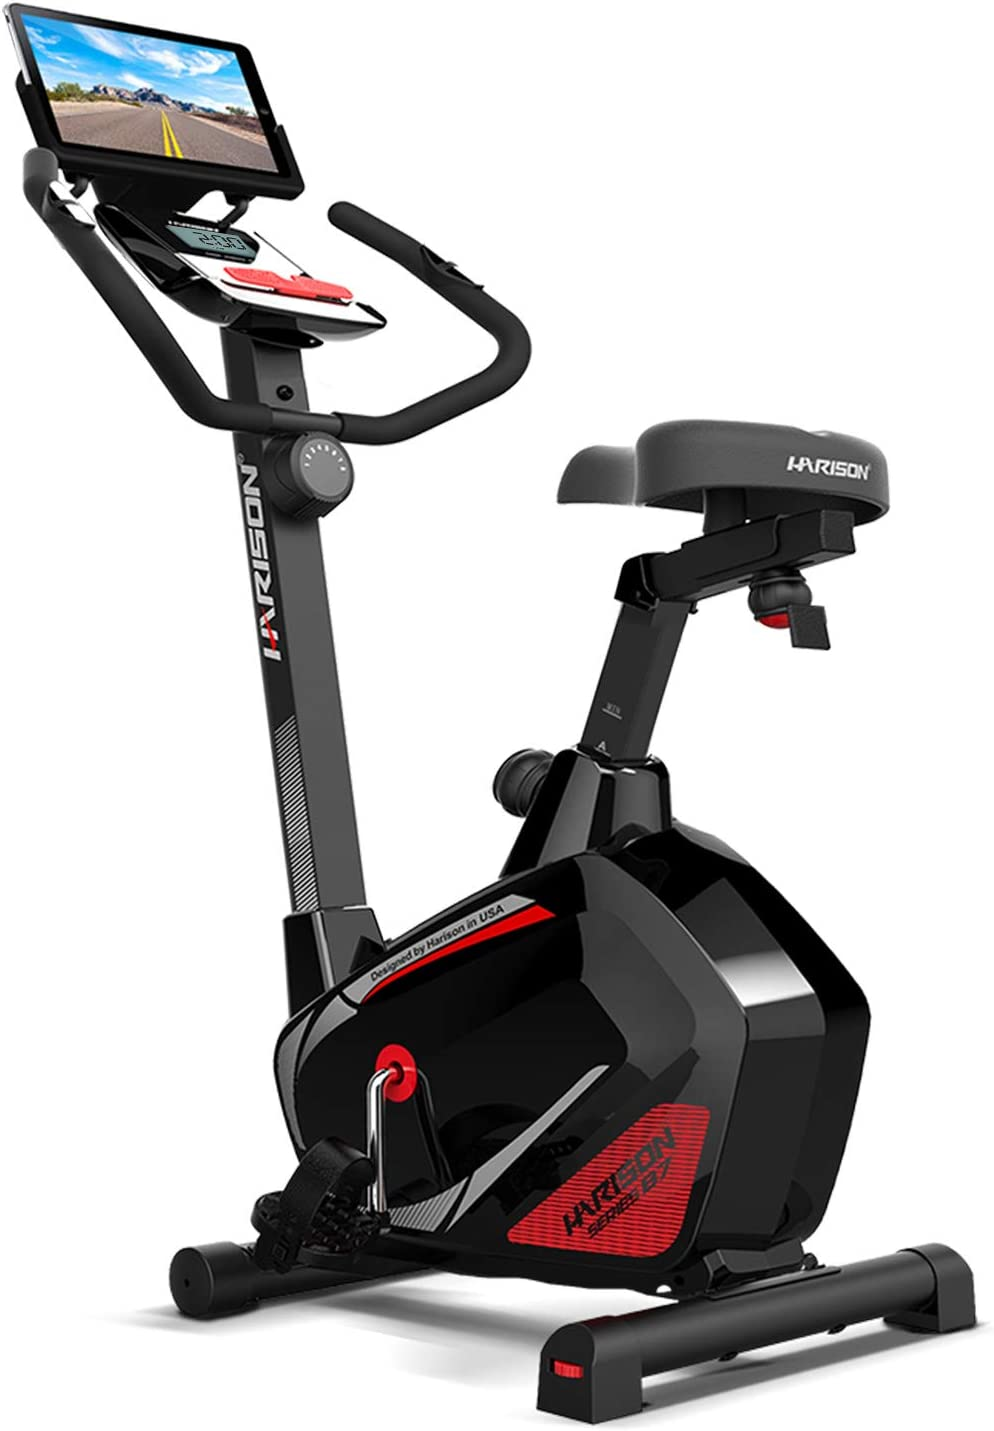 harison fitness bike